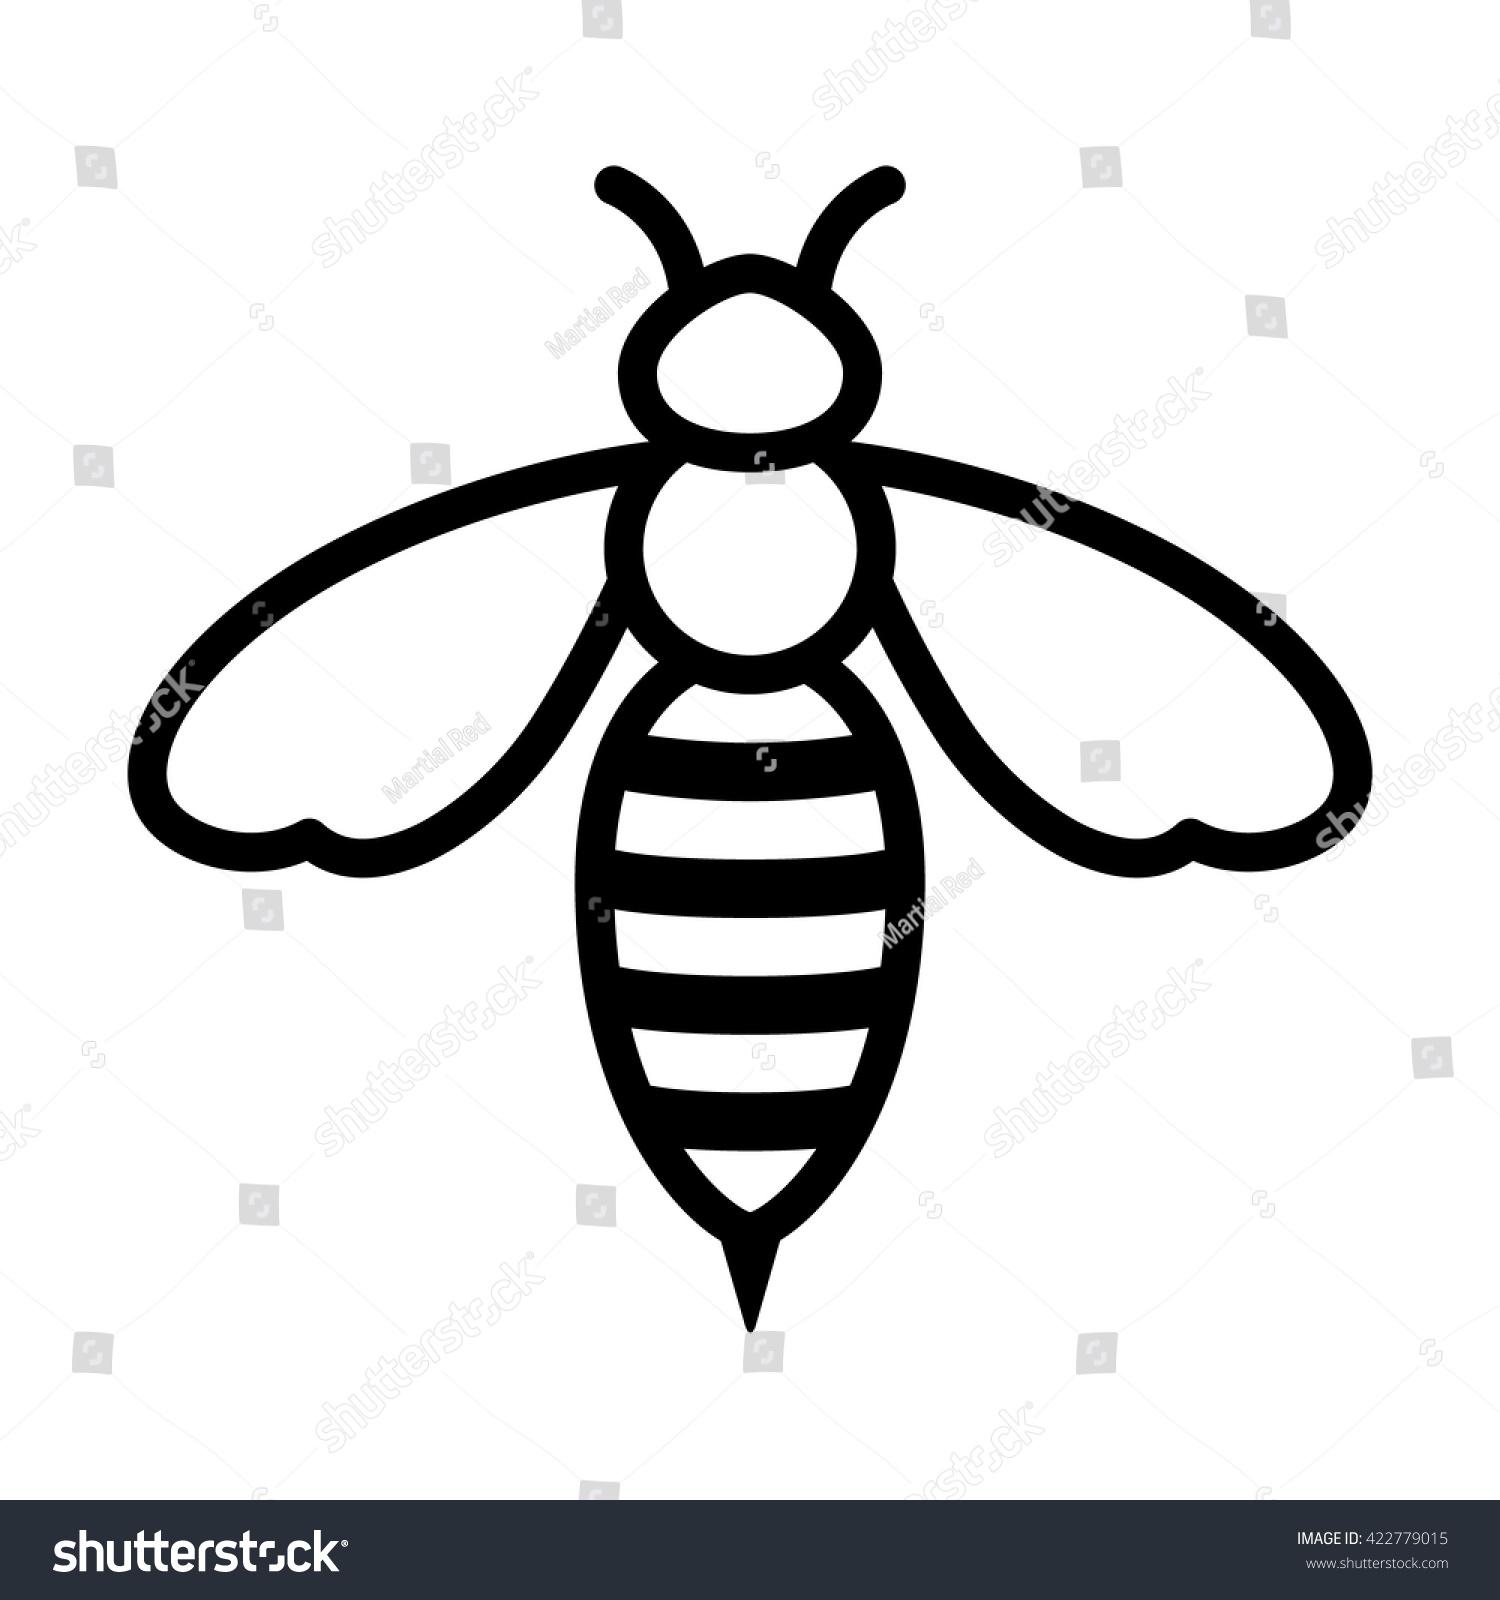 Line Art App : Honey bee wasp line art icon stock vector